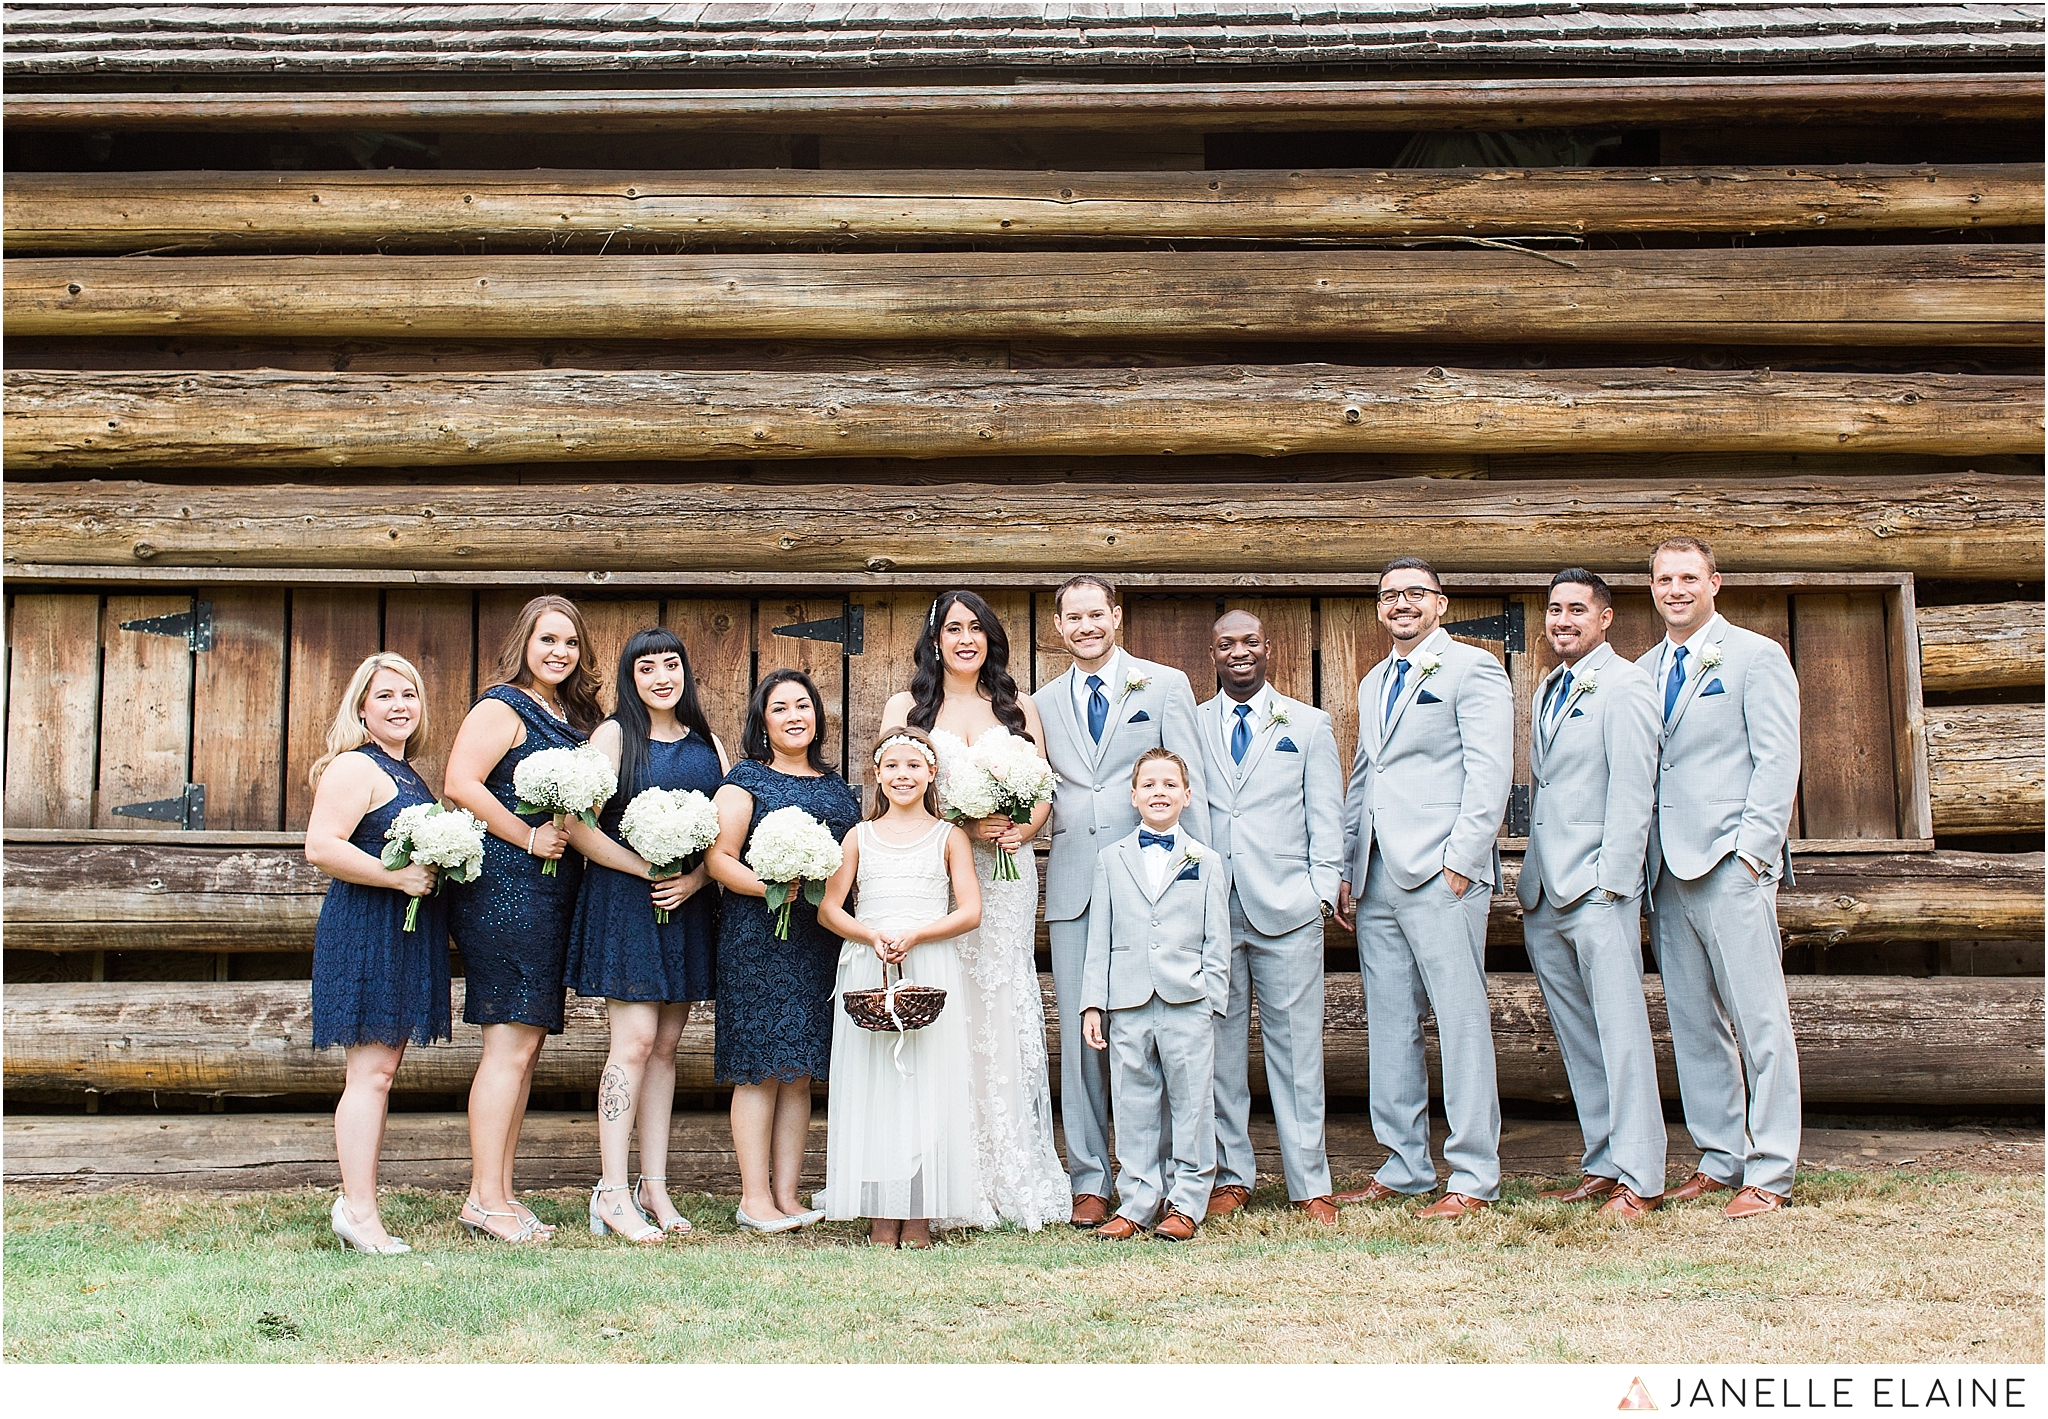 janelle elaine photography-professional wedding photographer-seattle-bellevue-robinswood house-185.jpg